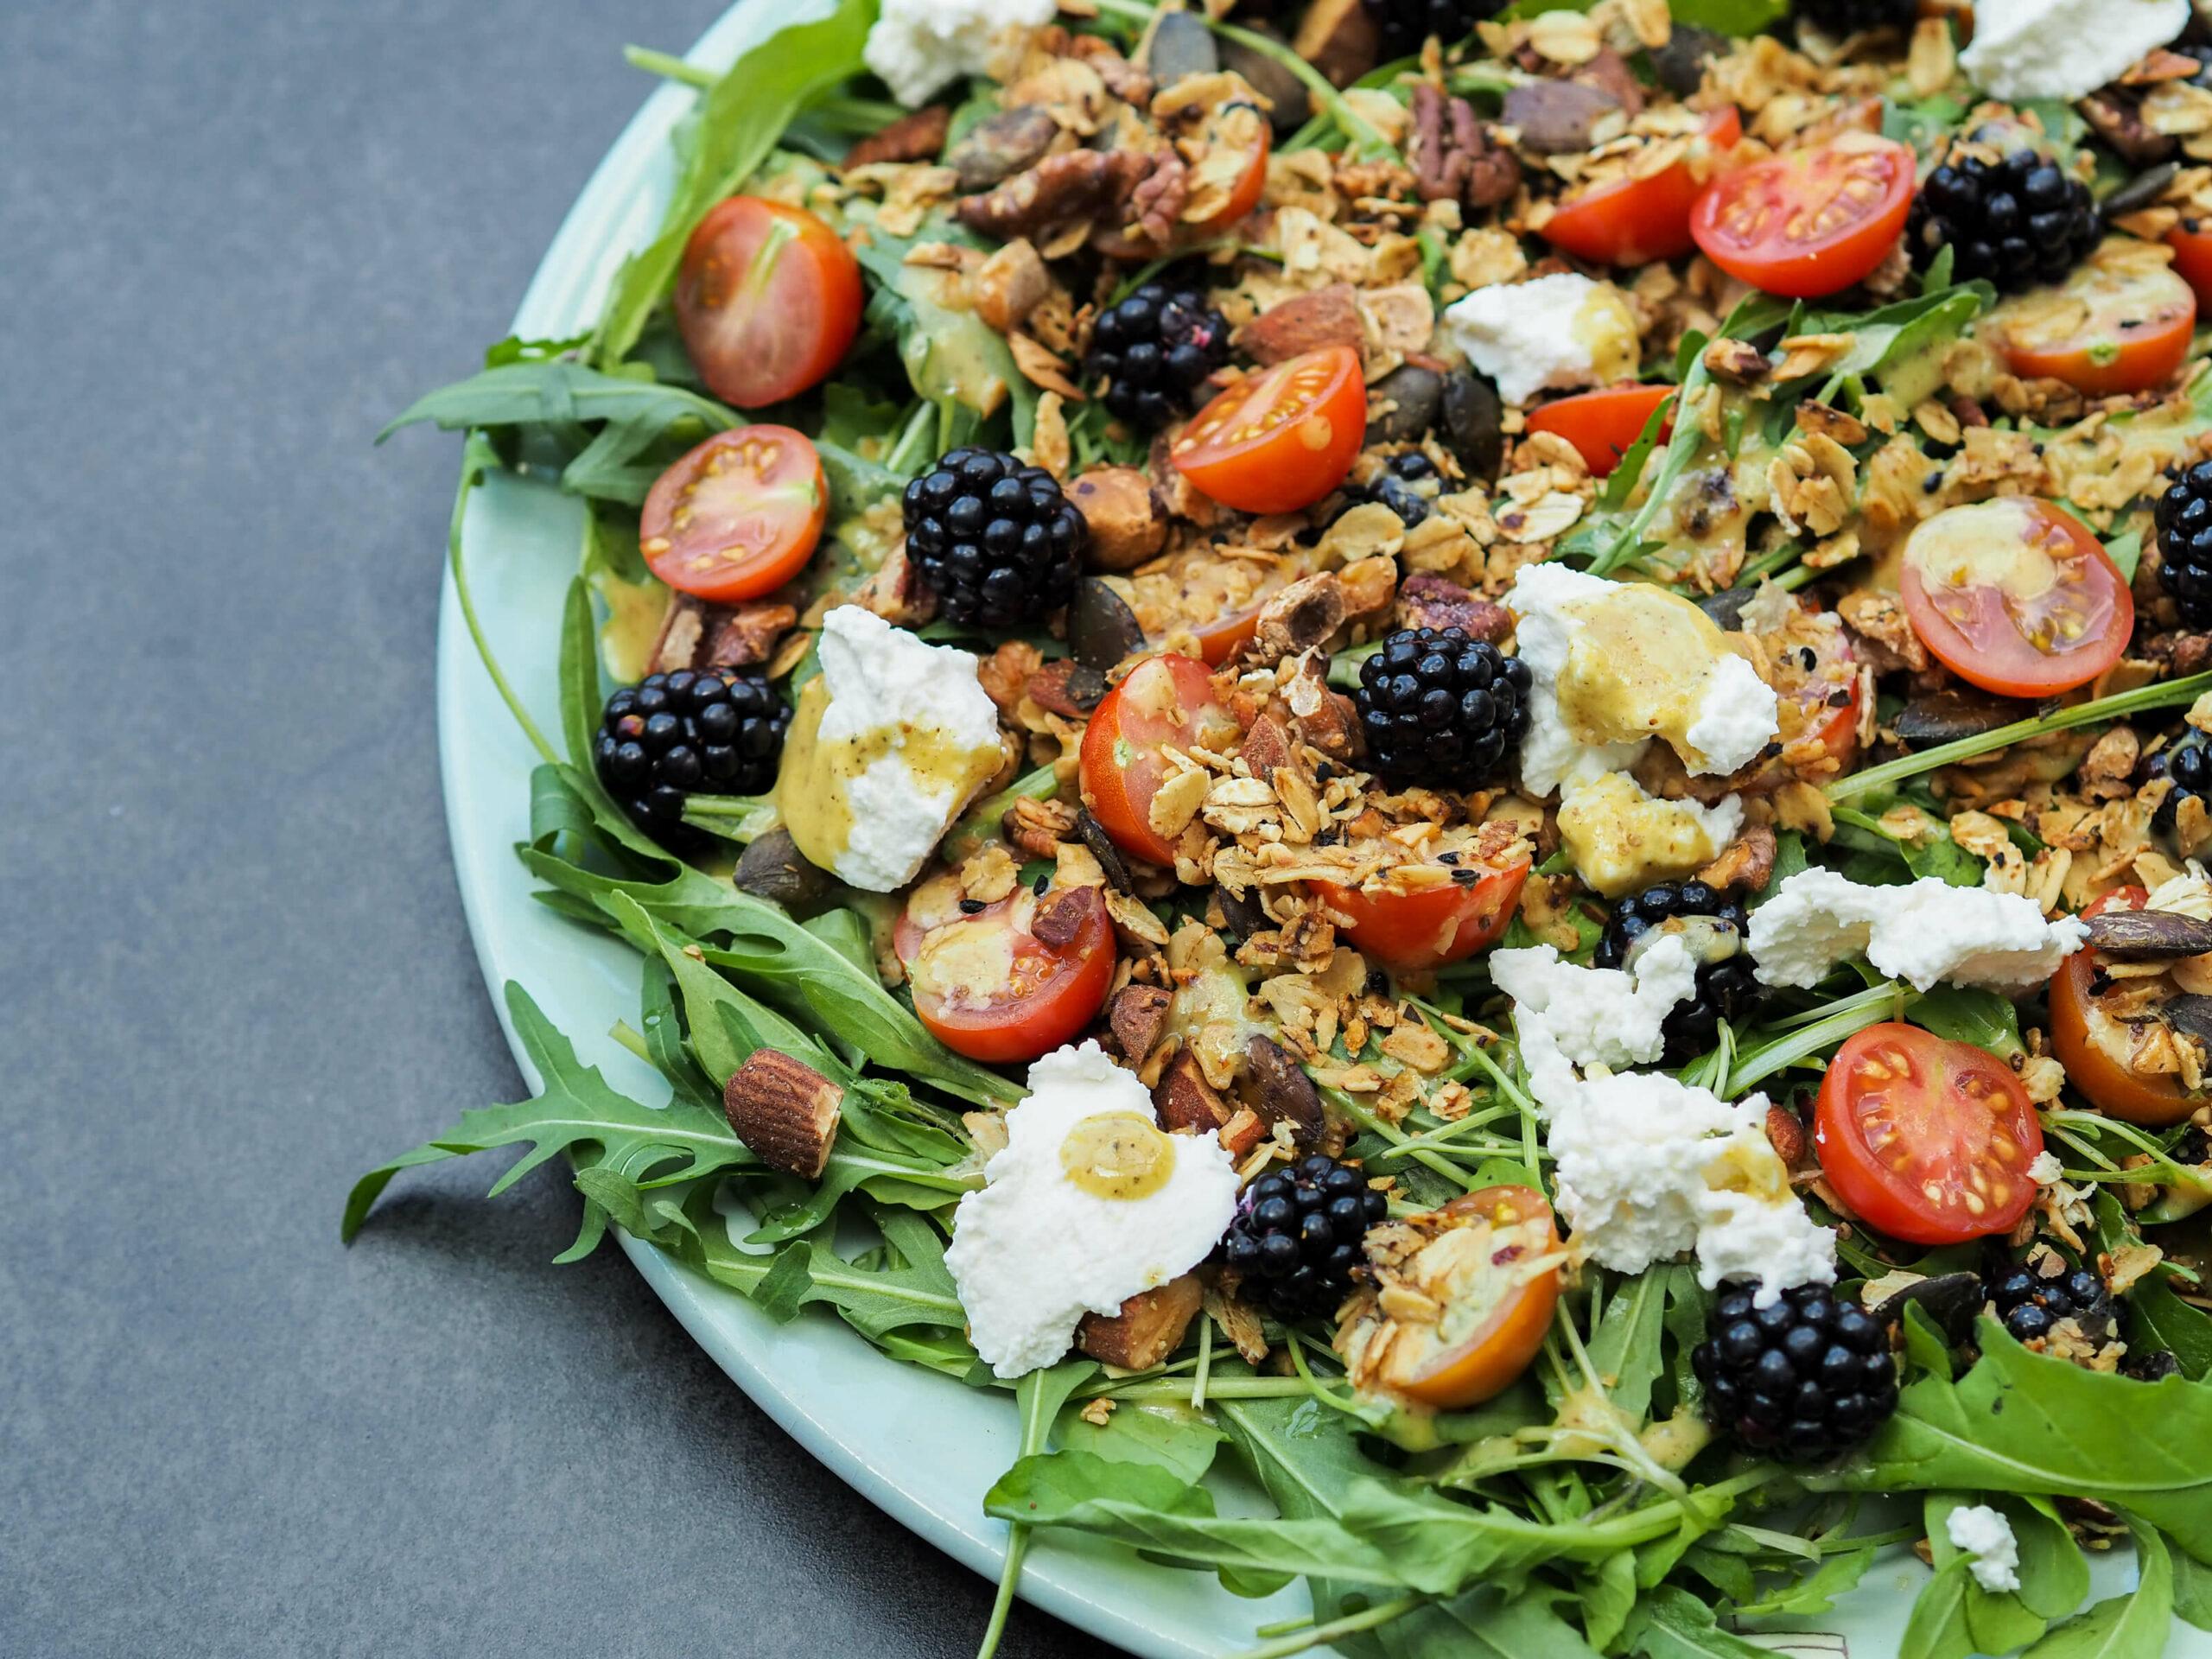 Herbstsalat |salziges Granola |Rucola | Tomaten |Ricotta